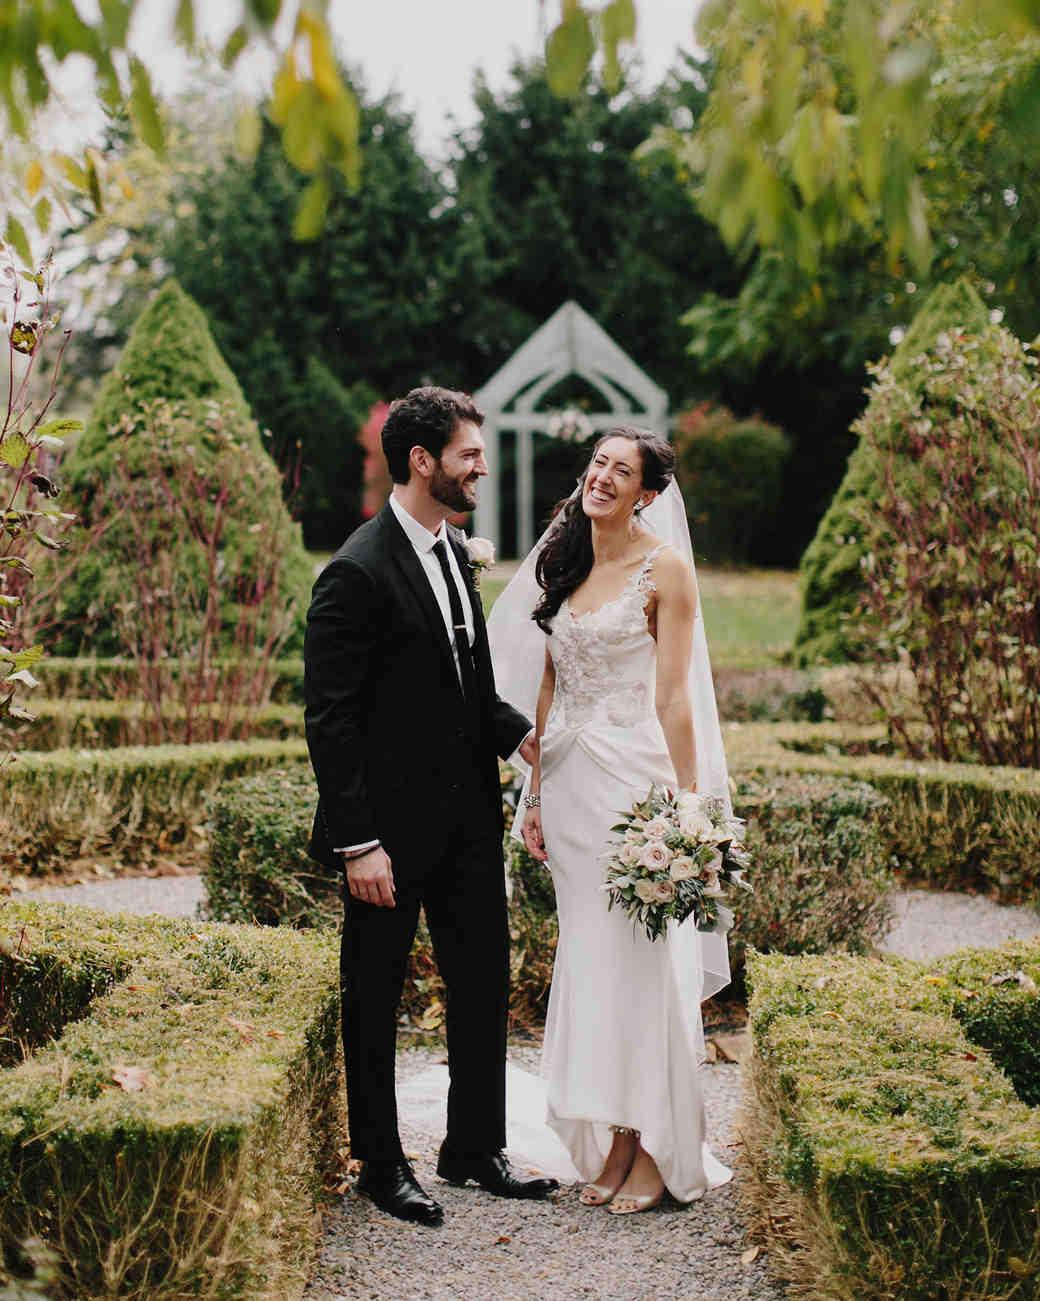 rosie-constantine-wedding-couple-297-s112177-1015.jpg